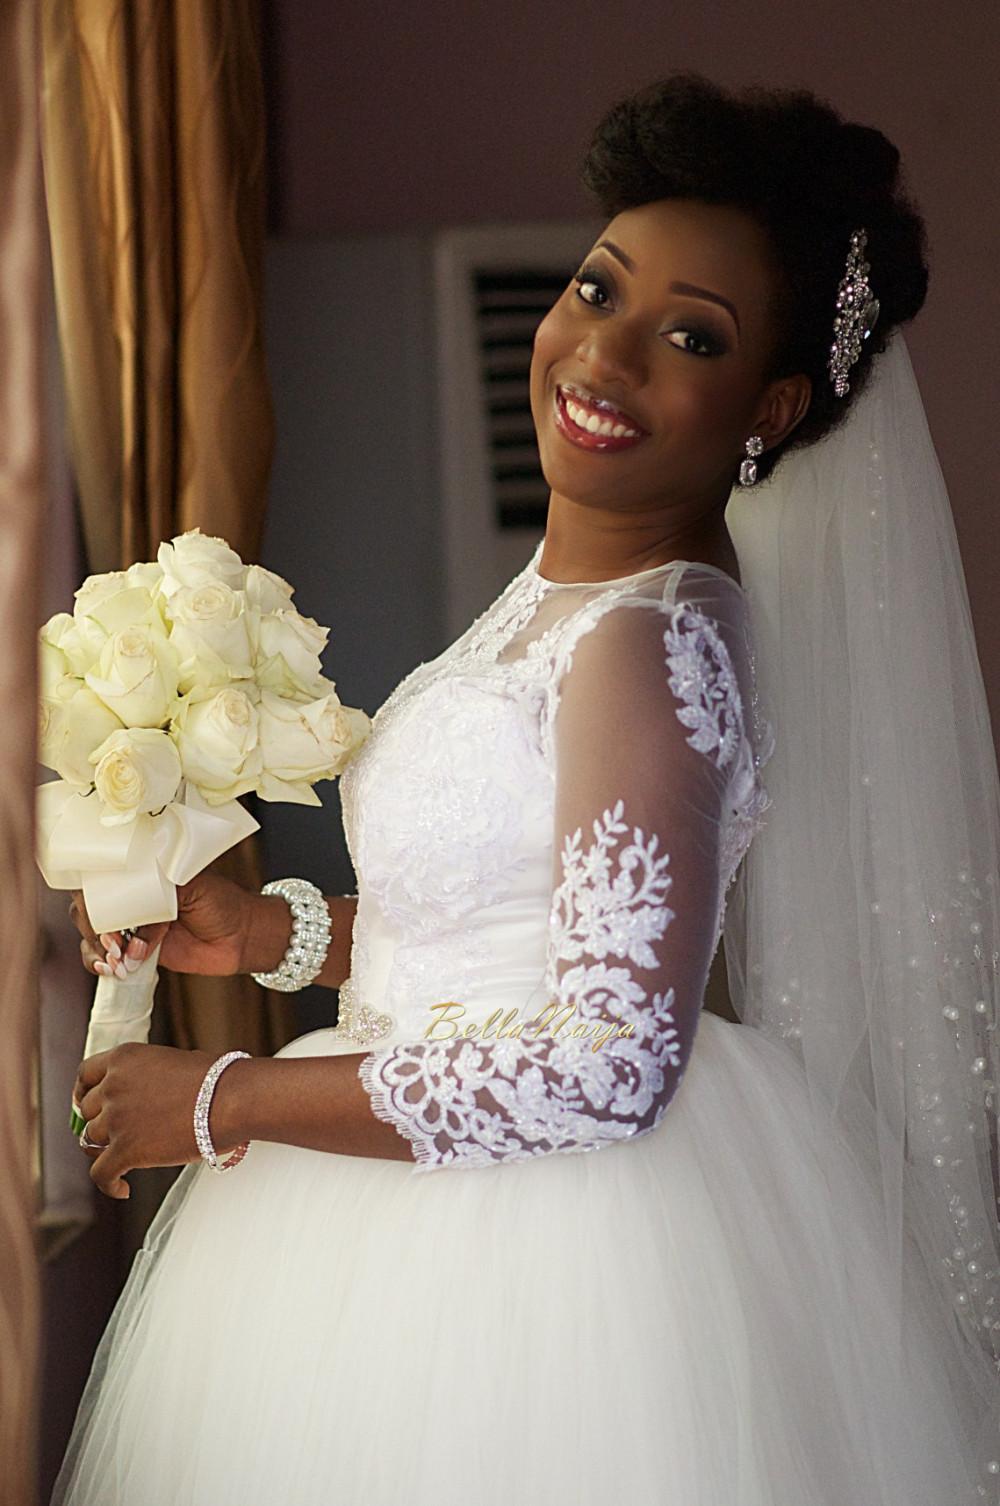 Newlywed Sisi Yemmie On U0026quot;How To Plan A Nigerian Weddingu0026quot;! | Watch - BellaNaija